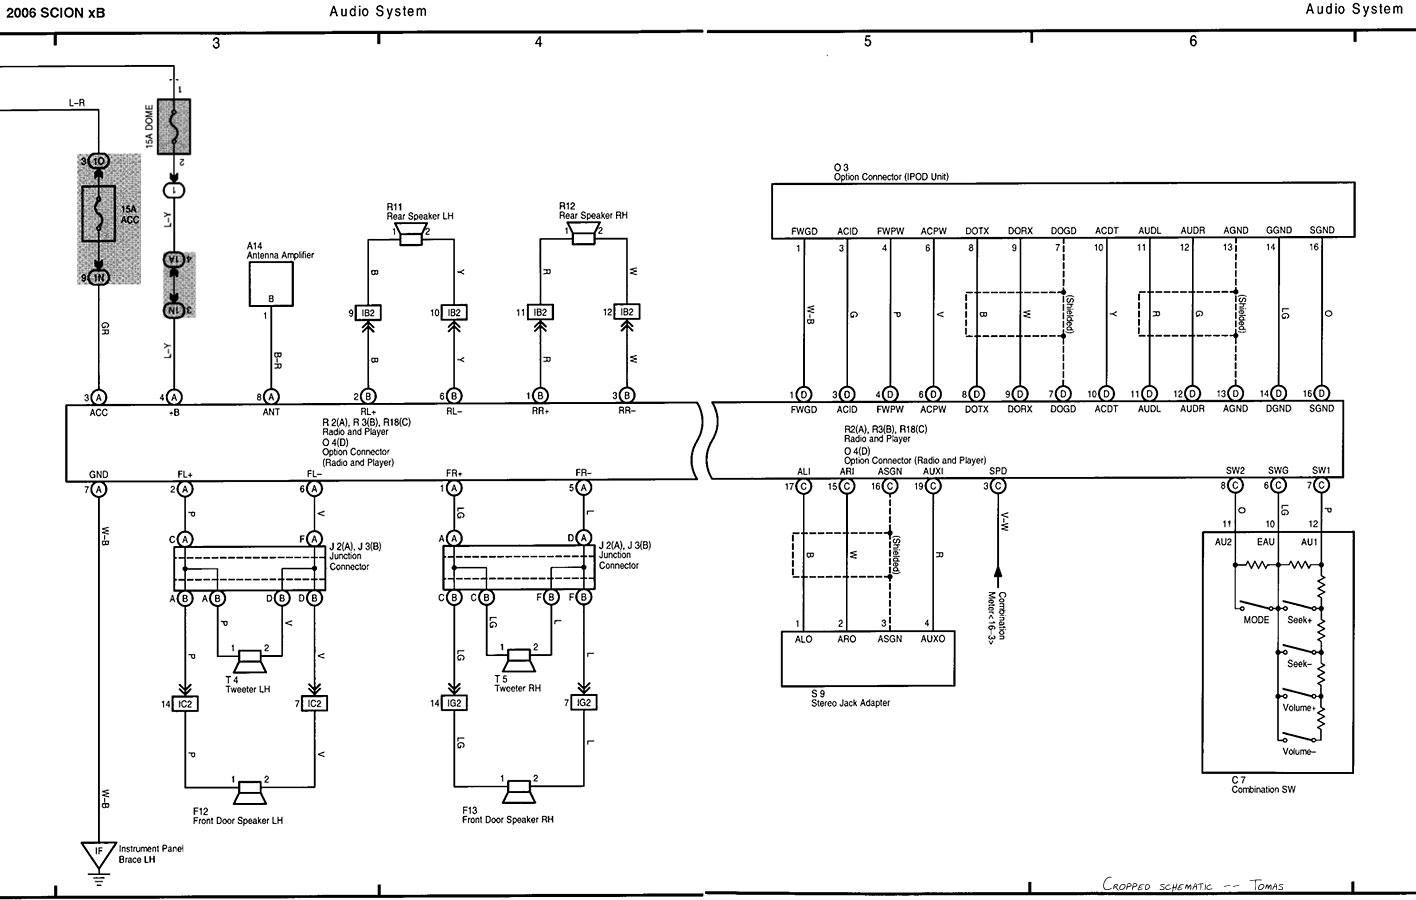 2014 Scion Tc Stereo Wiring Diagram - Crf250x Wiring Diagram for Wiring  Diagram Schematics | 2014 Scion Tc Wiring Diagram |  | Wiring Diagram Schematics